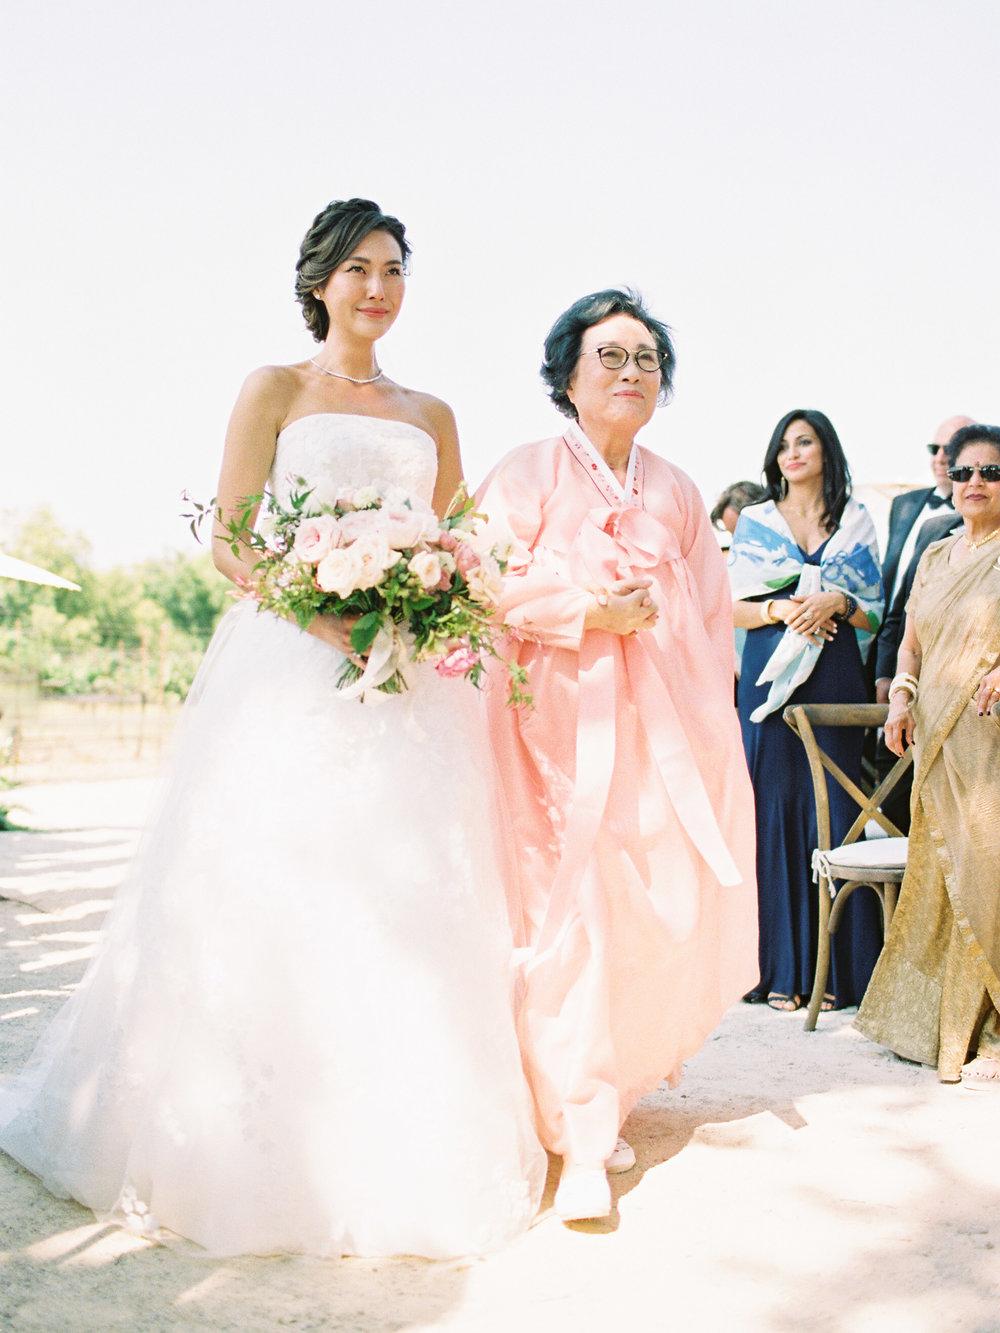 KS-Editorial-267-Jen-Huang-006961-R2-032.jpg